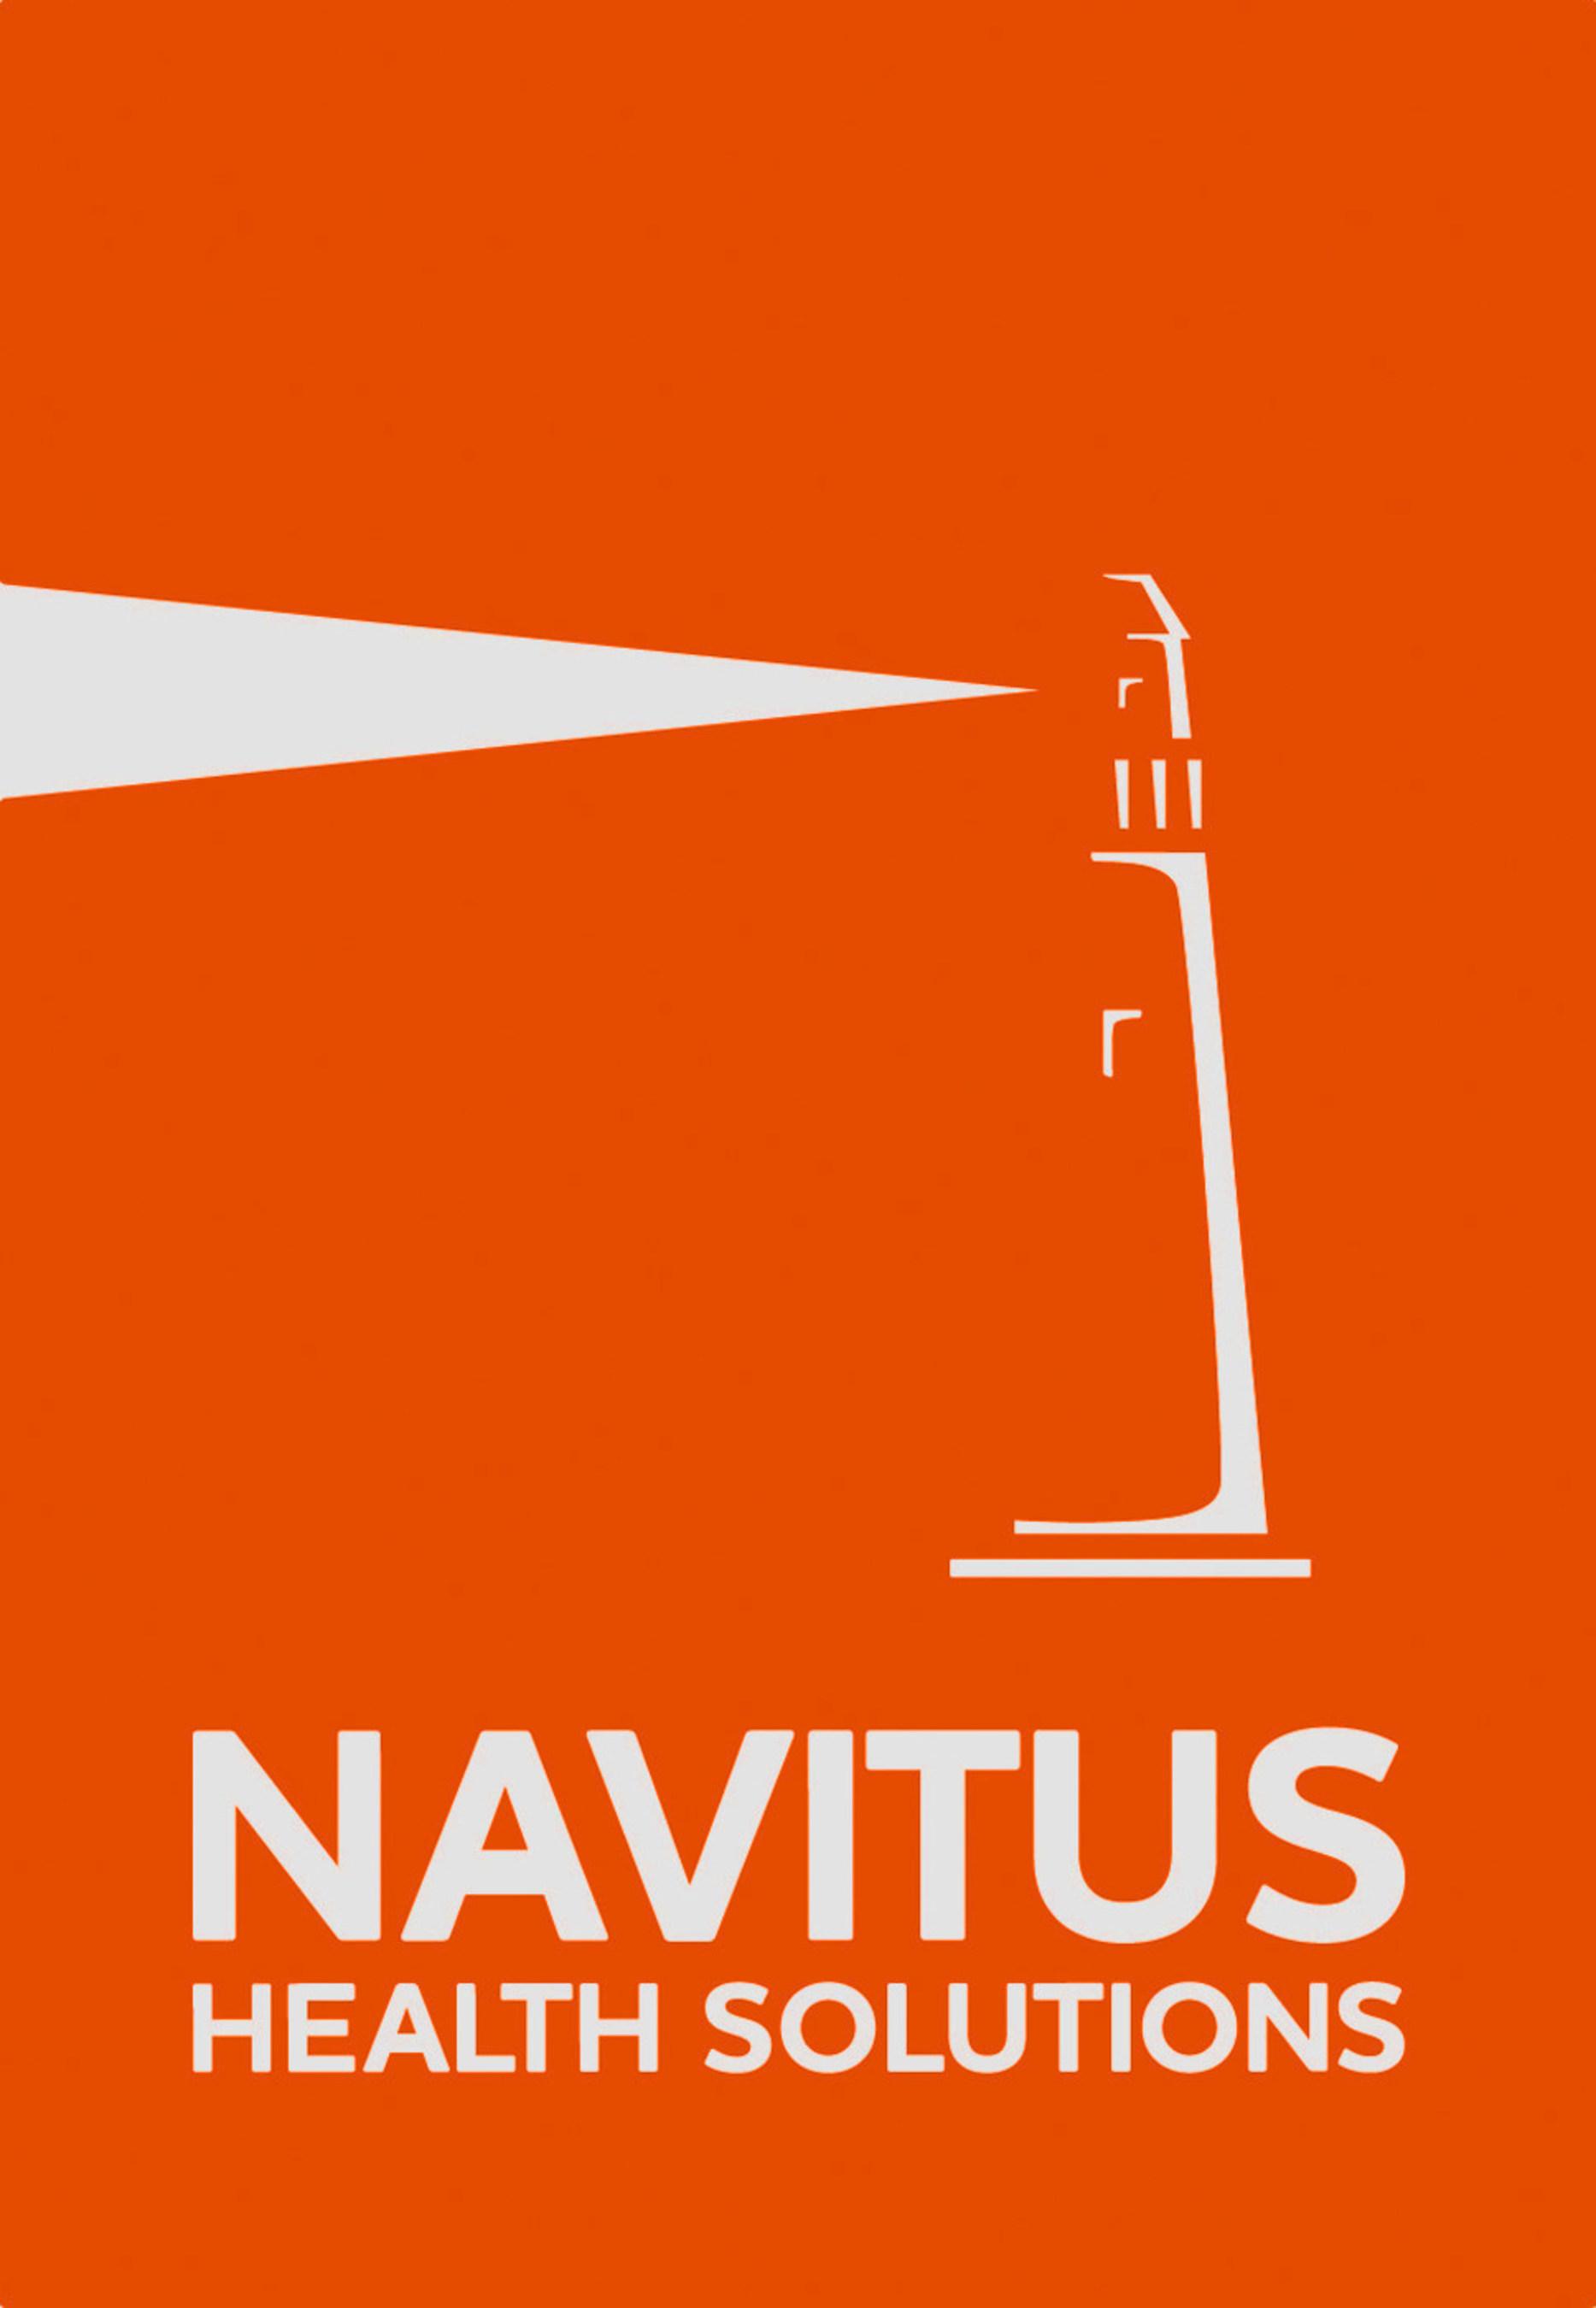 Navitus Health Solutions